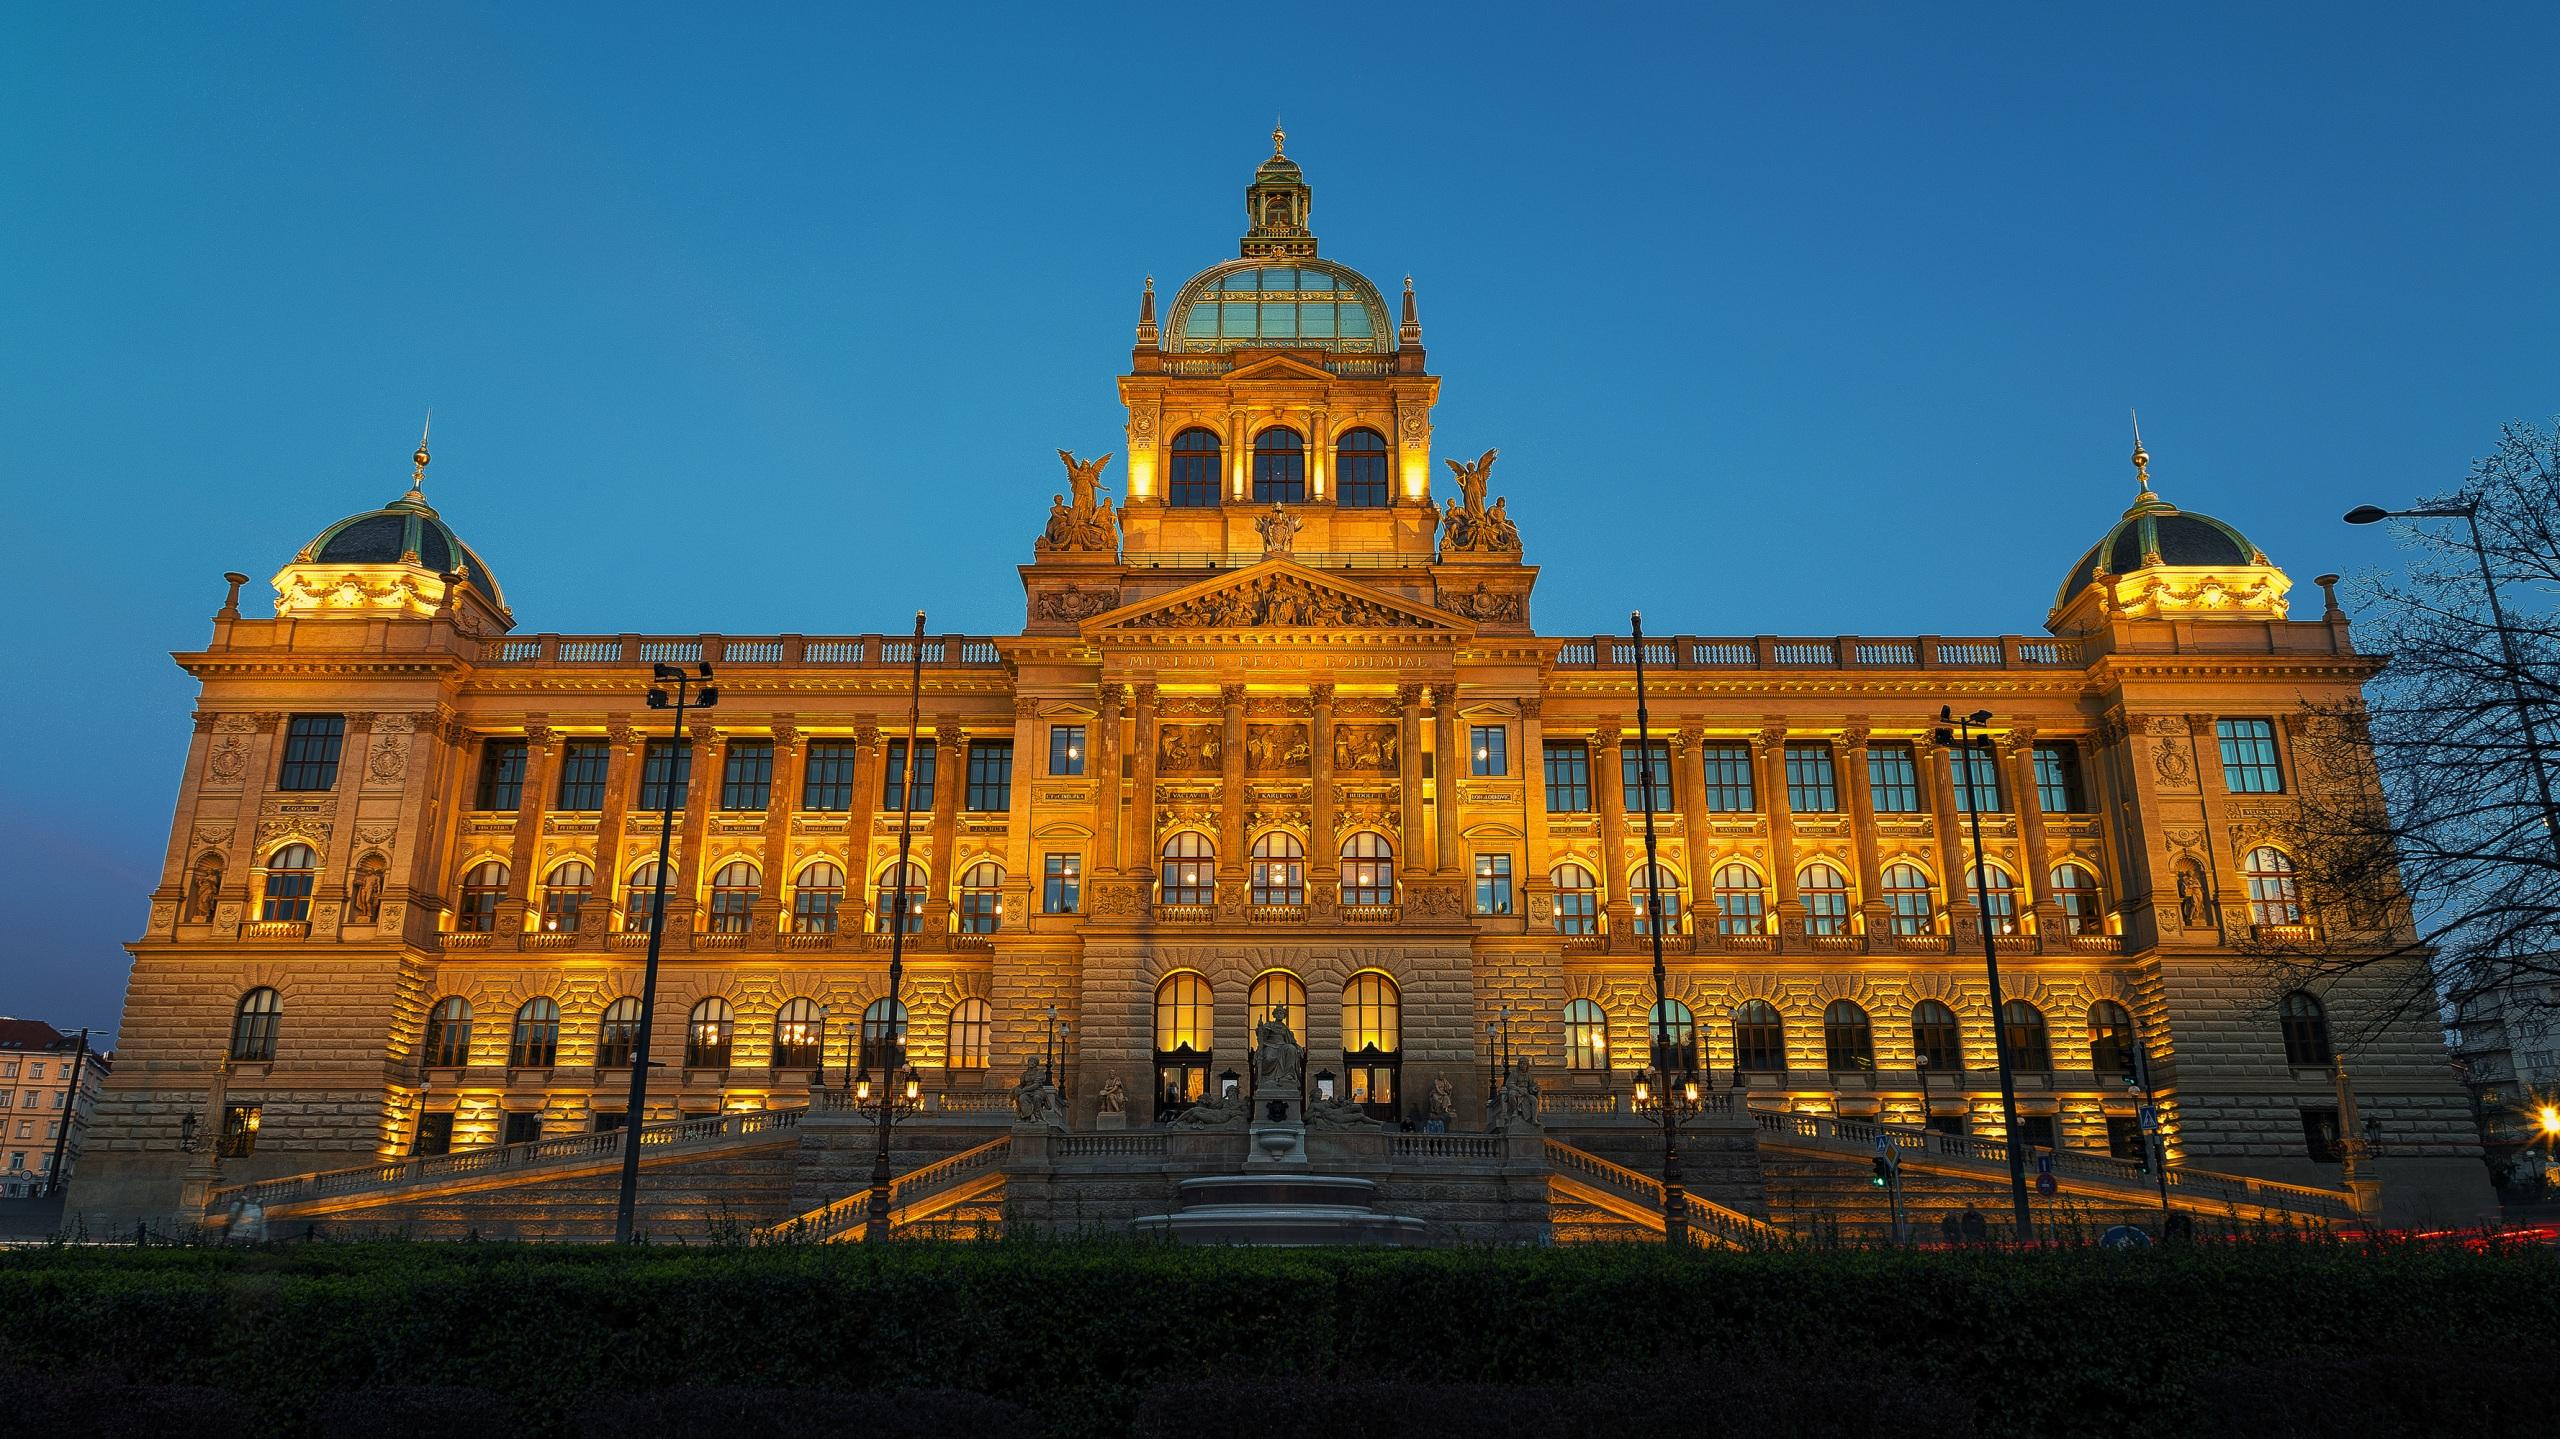 Фотография Прага Чехия музеи National Museum Лестница Вечер Уличные фонари Дома Города 2560x1439 Музей лестницы город Здания